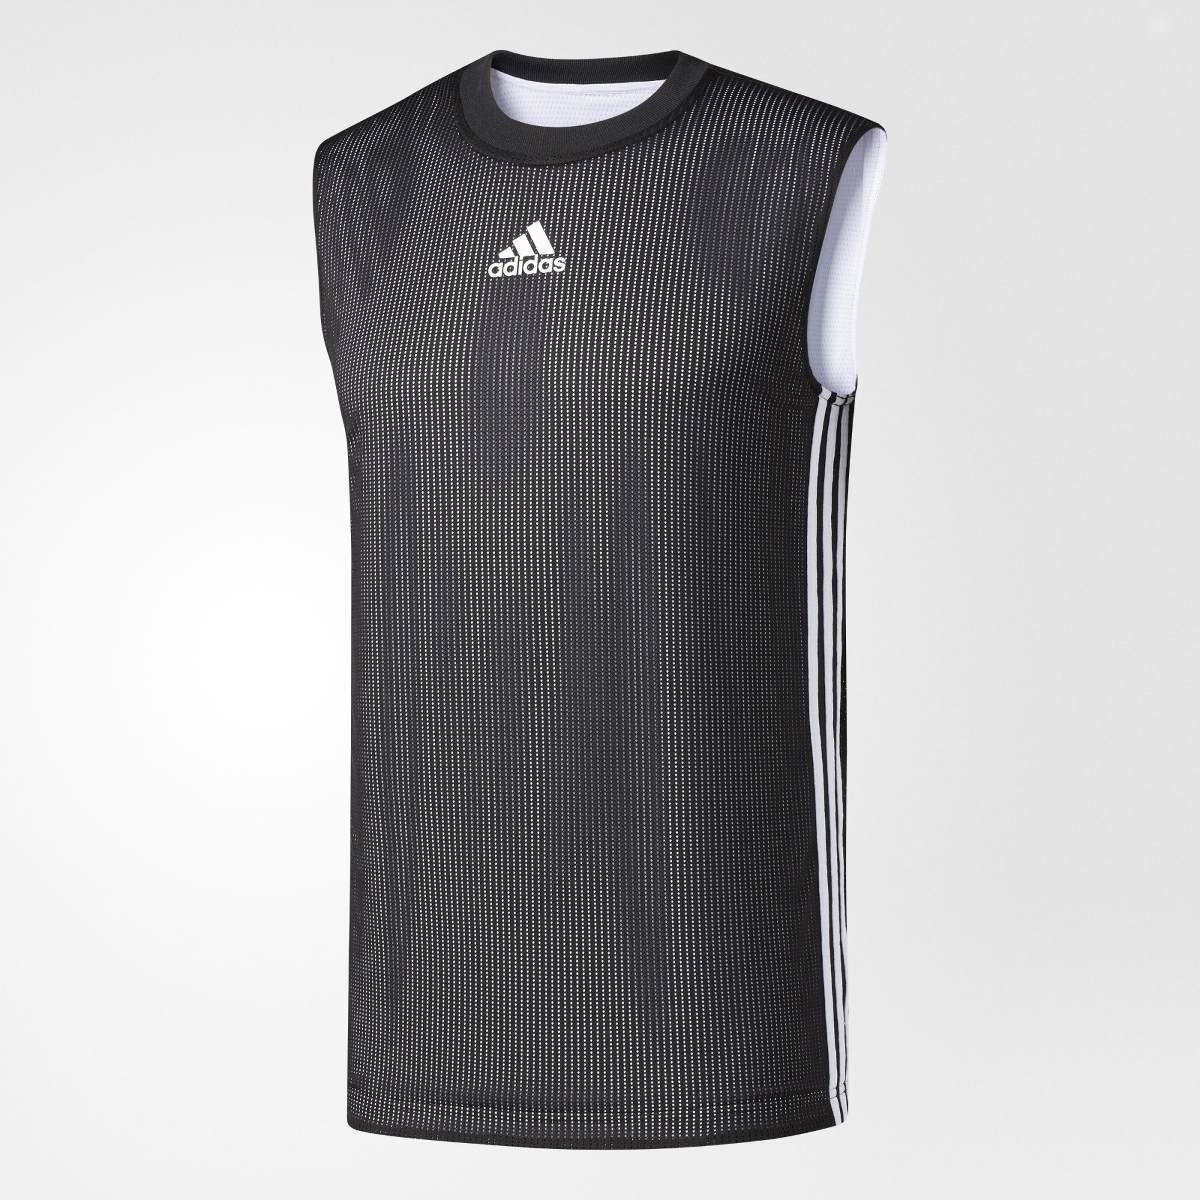 9f04d6422f camiseta regata dupla face adidas 2017 18 - preto   branco. Carregando zoom.